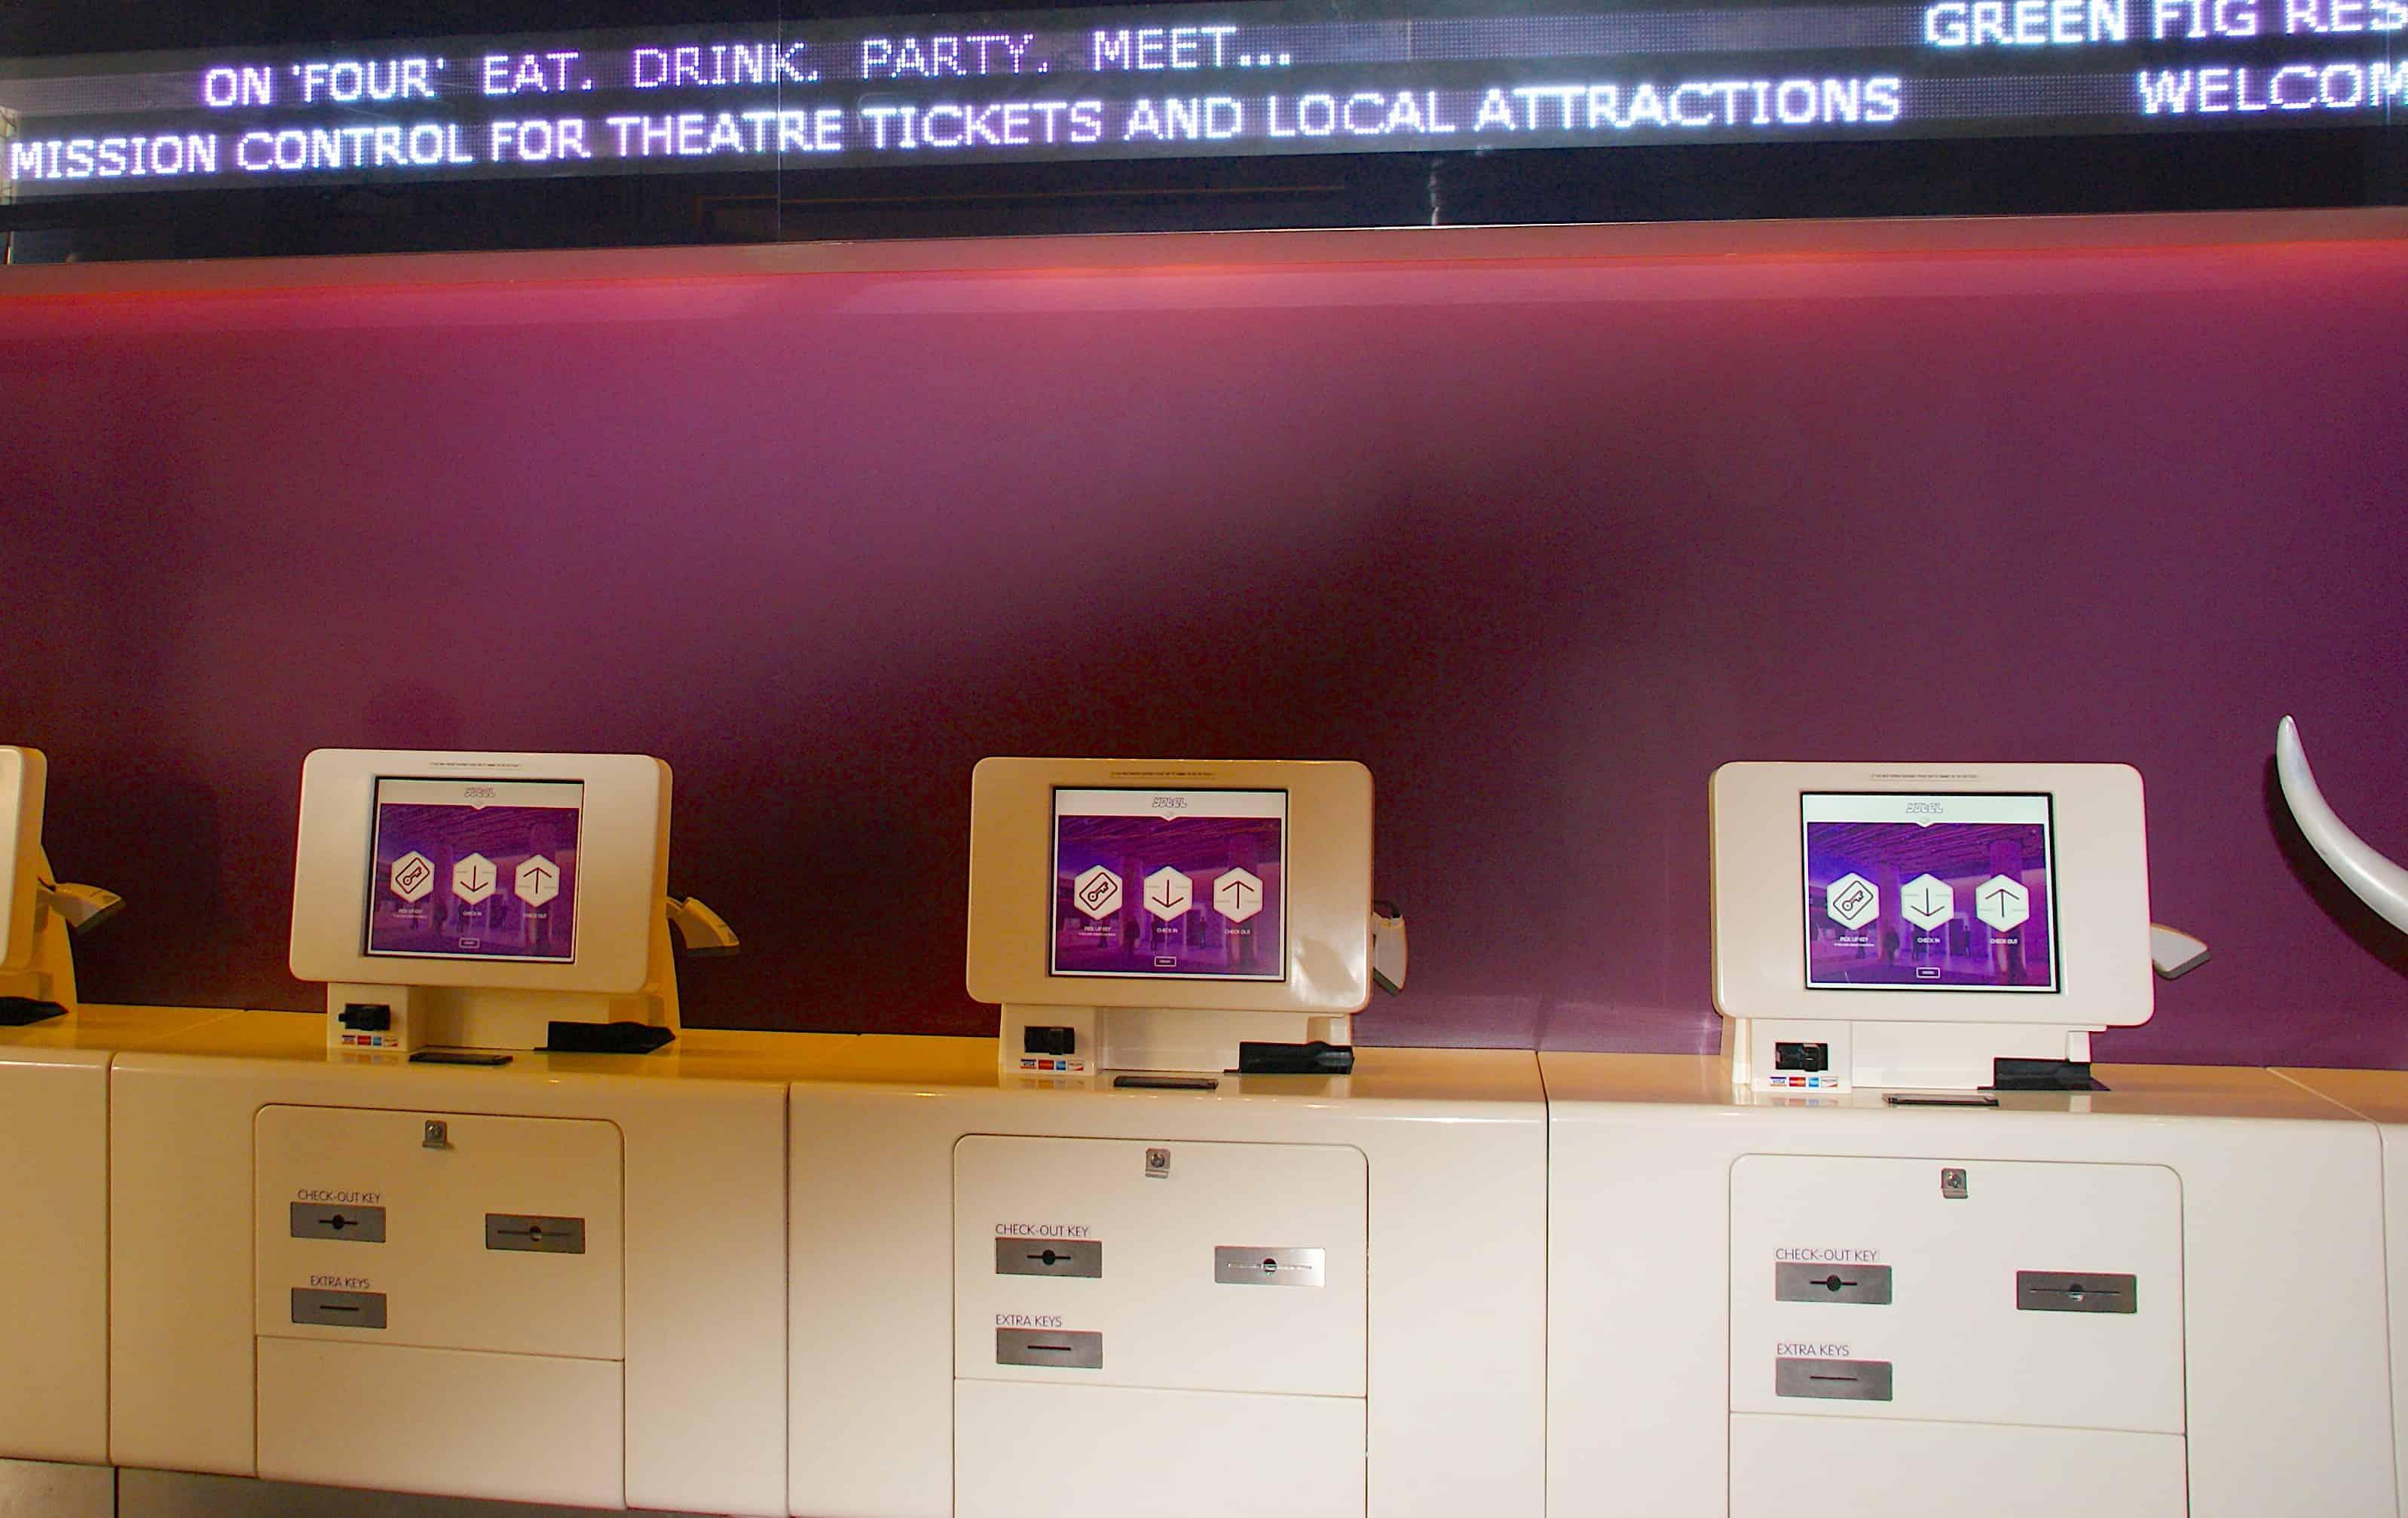 YOTEL Midtown Manhattan Check-in Kiosk